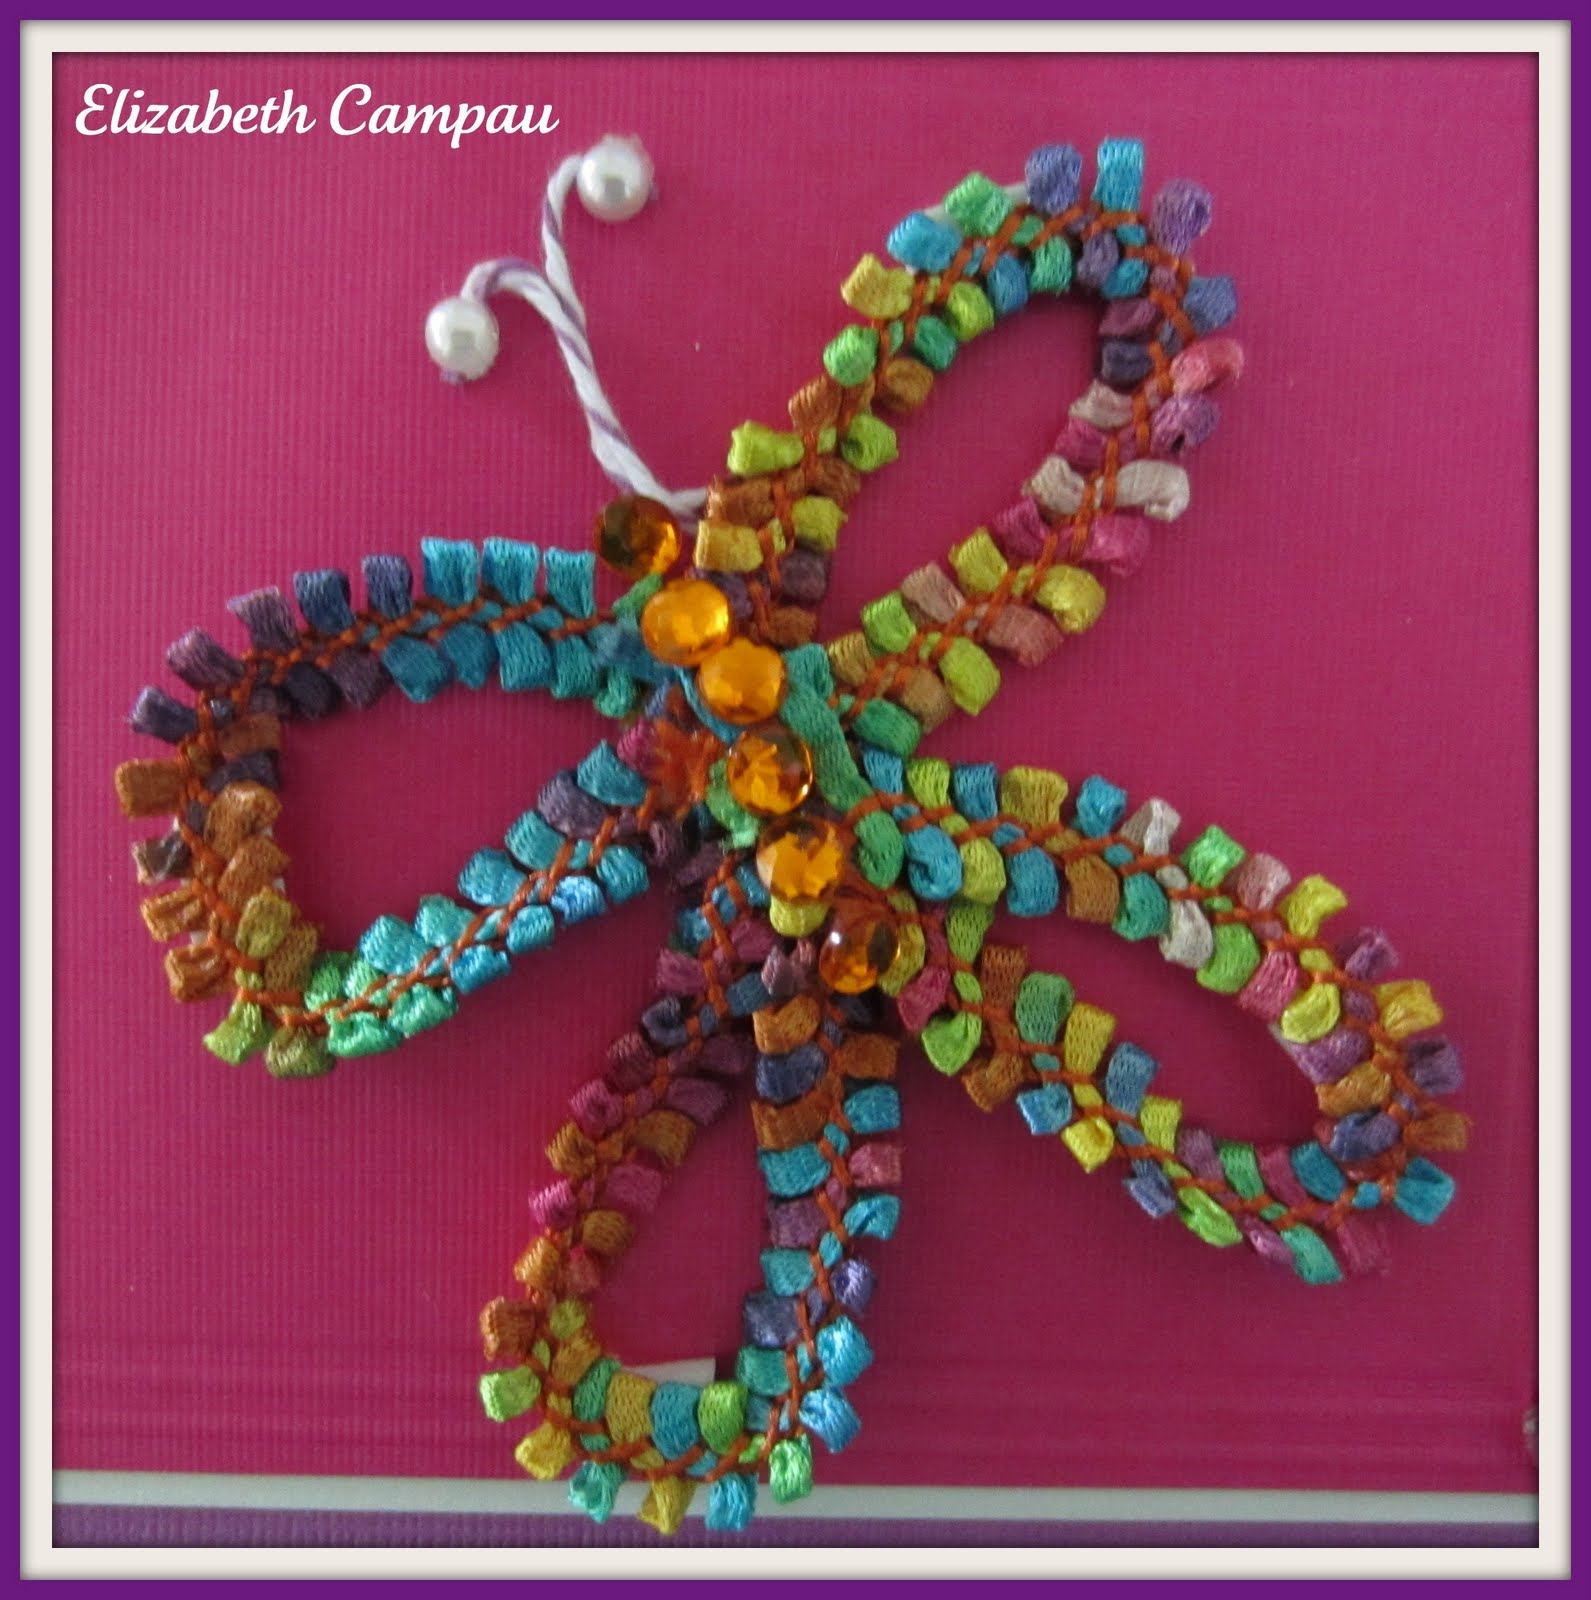 http://2.bp.blogspot.com/-1vfwdZnUi3E/TgzgzdpLvQI/AAAAAAAAAOs/cjH_NWT8Sx8/s1600/Ribbon+Butterfly+Card+Revised+003.jpg